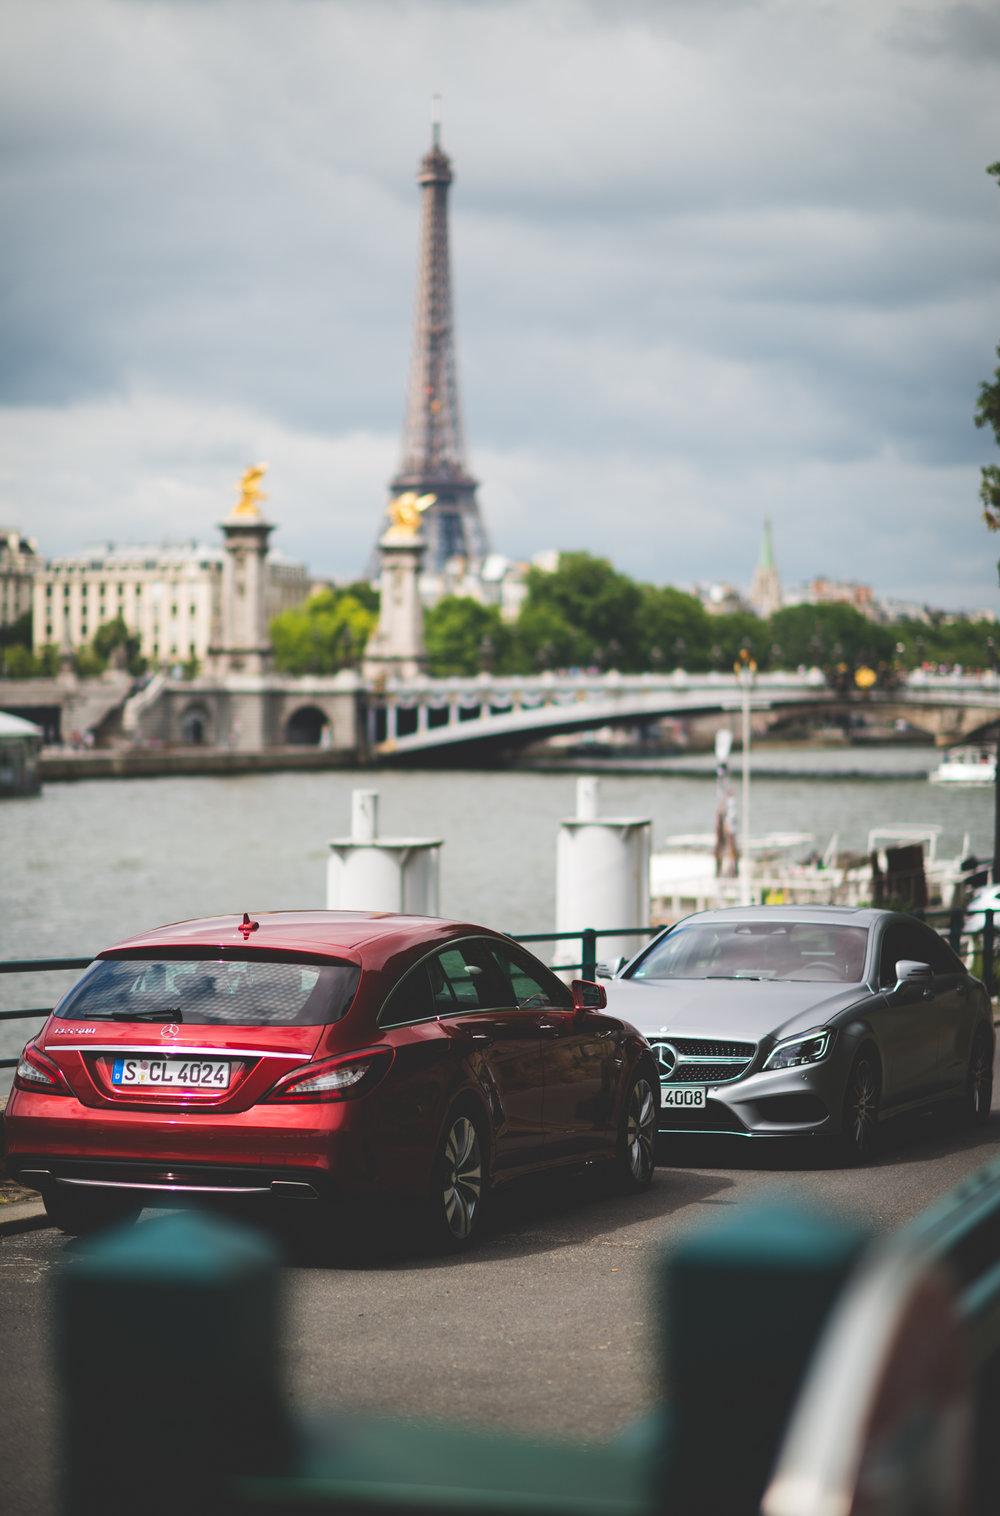 MB_HB_PARIS_Blog-28.jpg